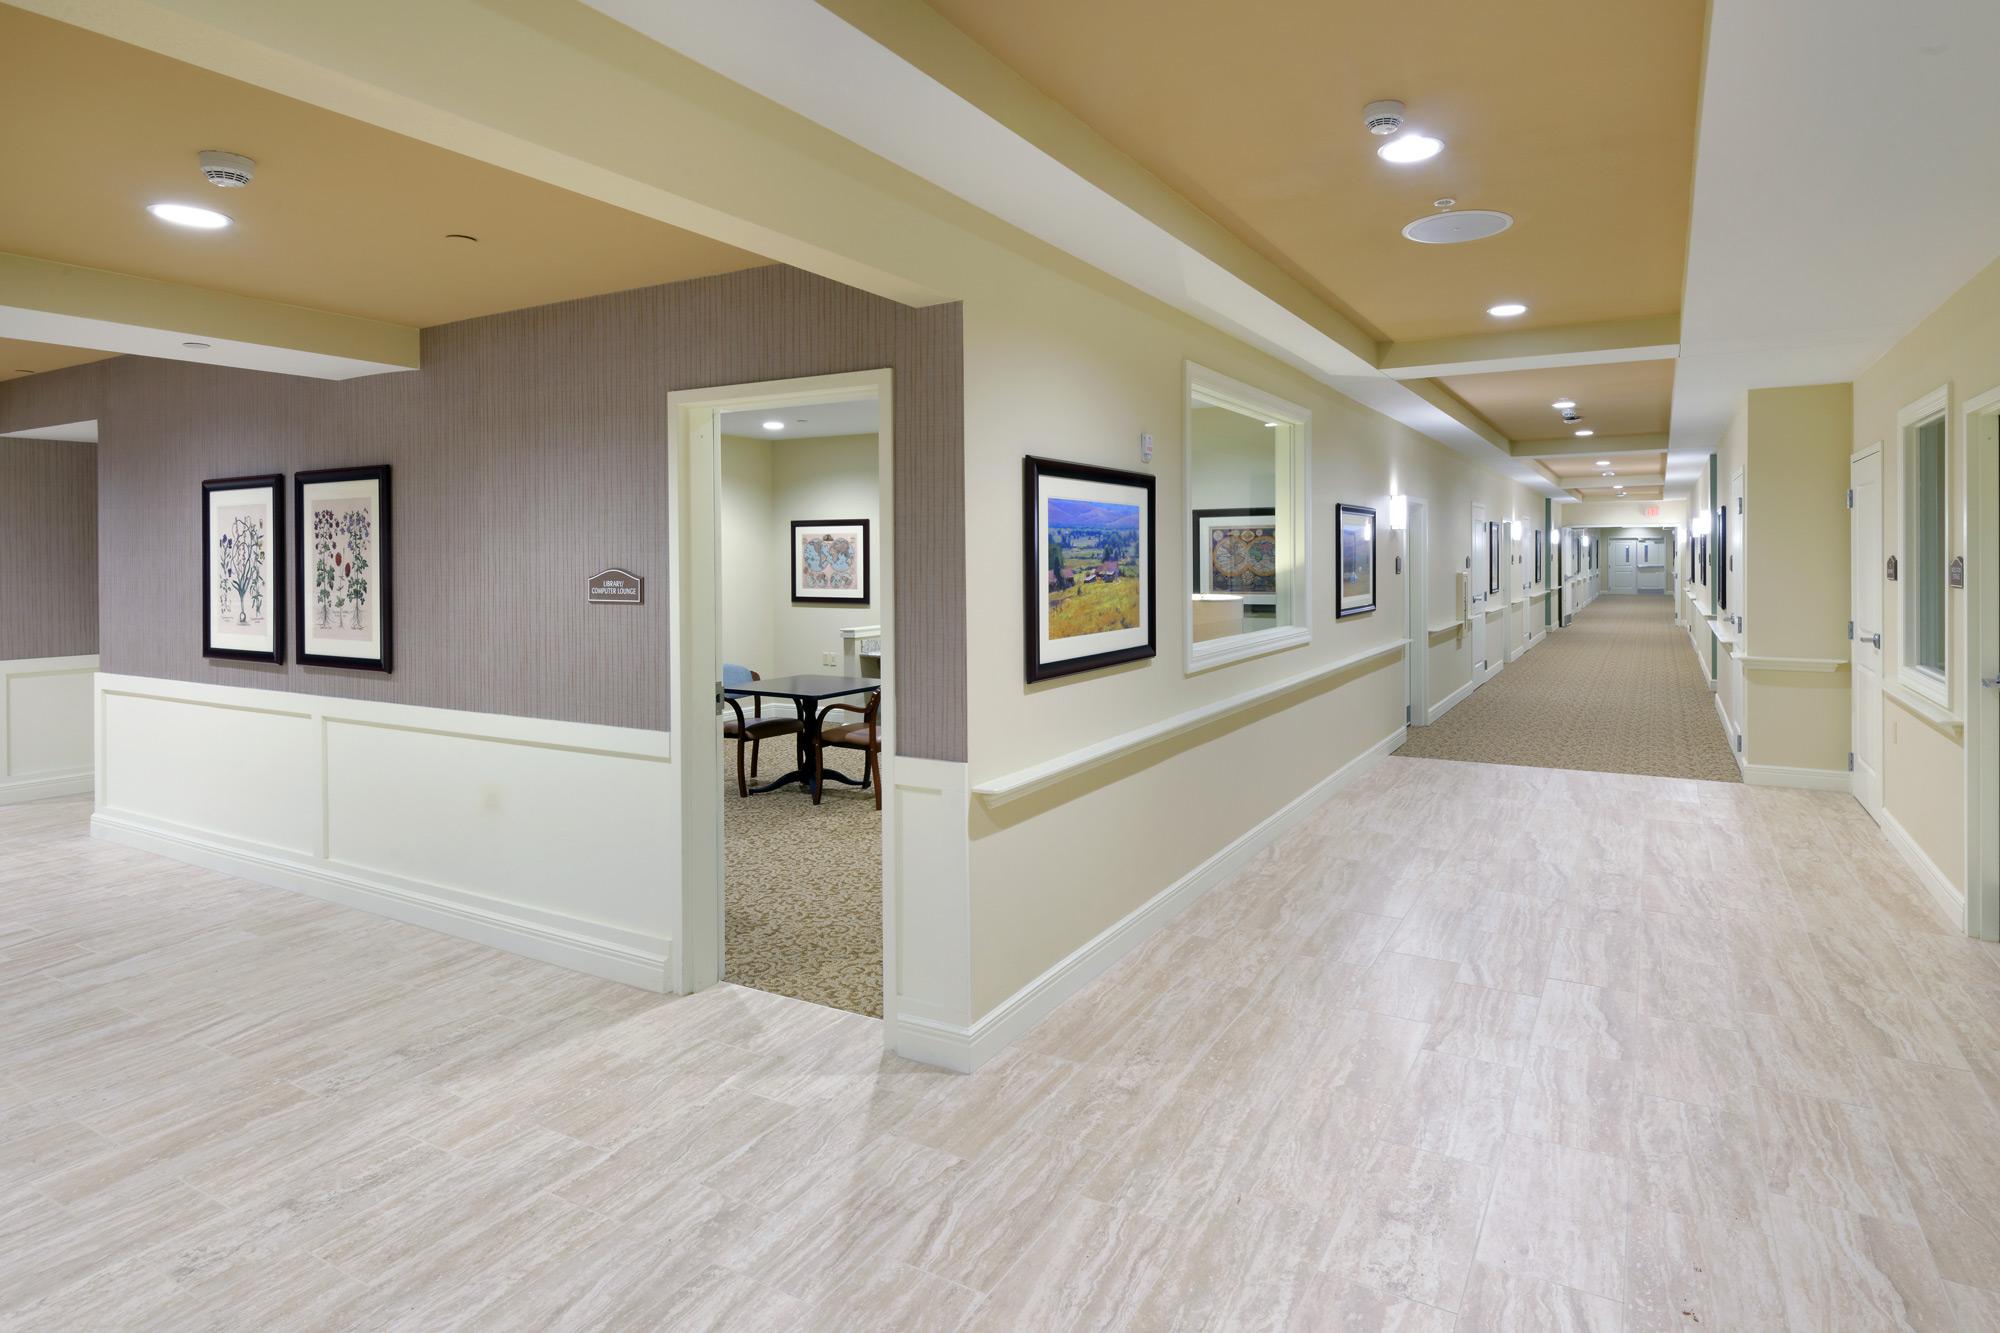 Castlewood-Senior-Living-H-Design-Interior-01.jpg